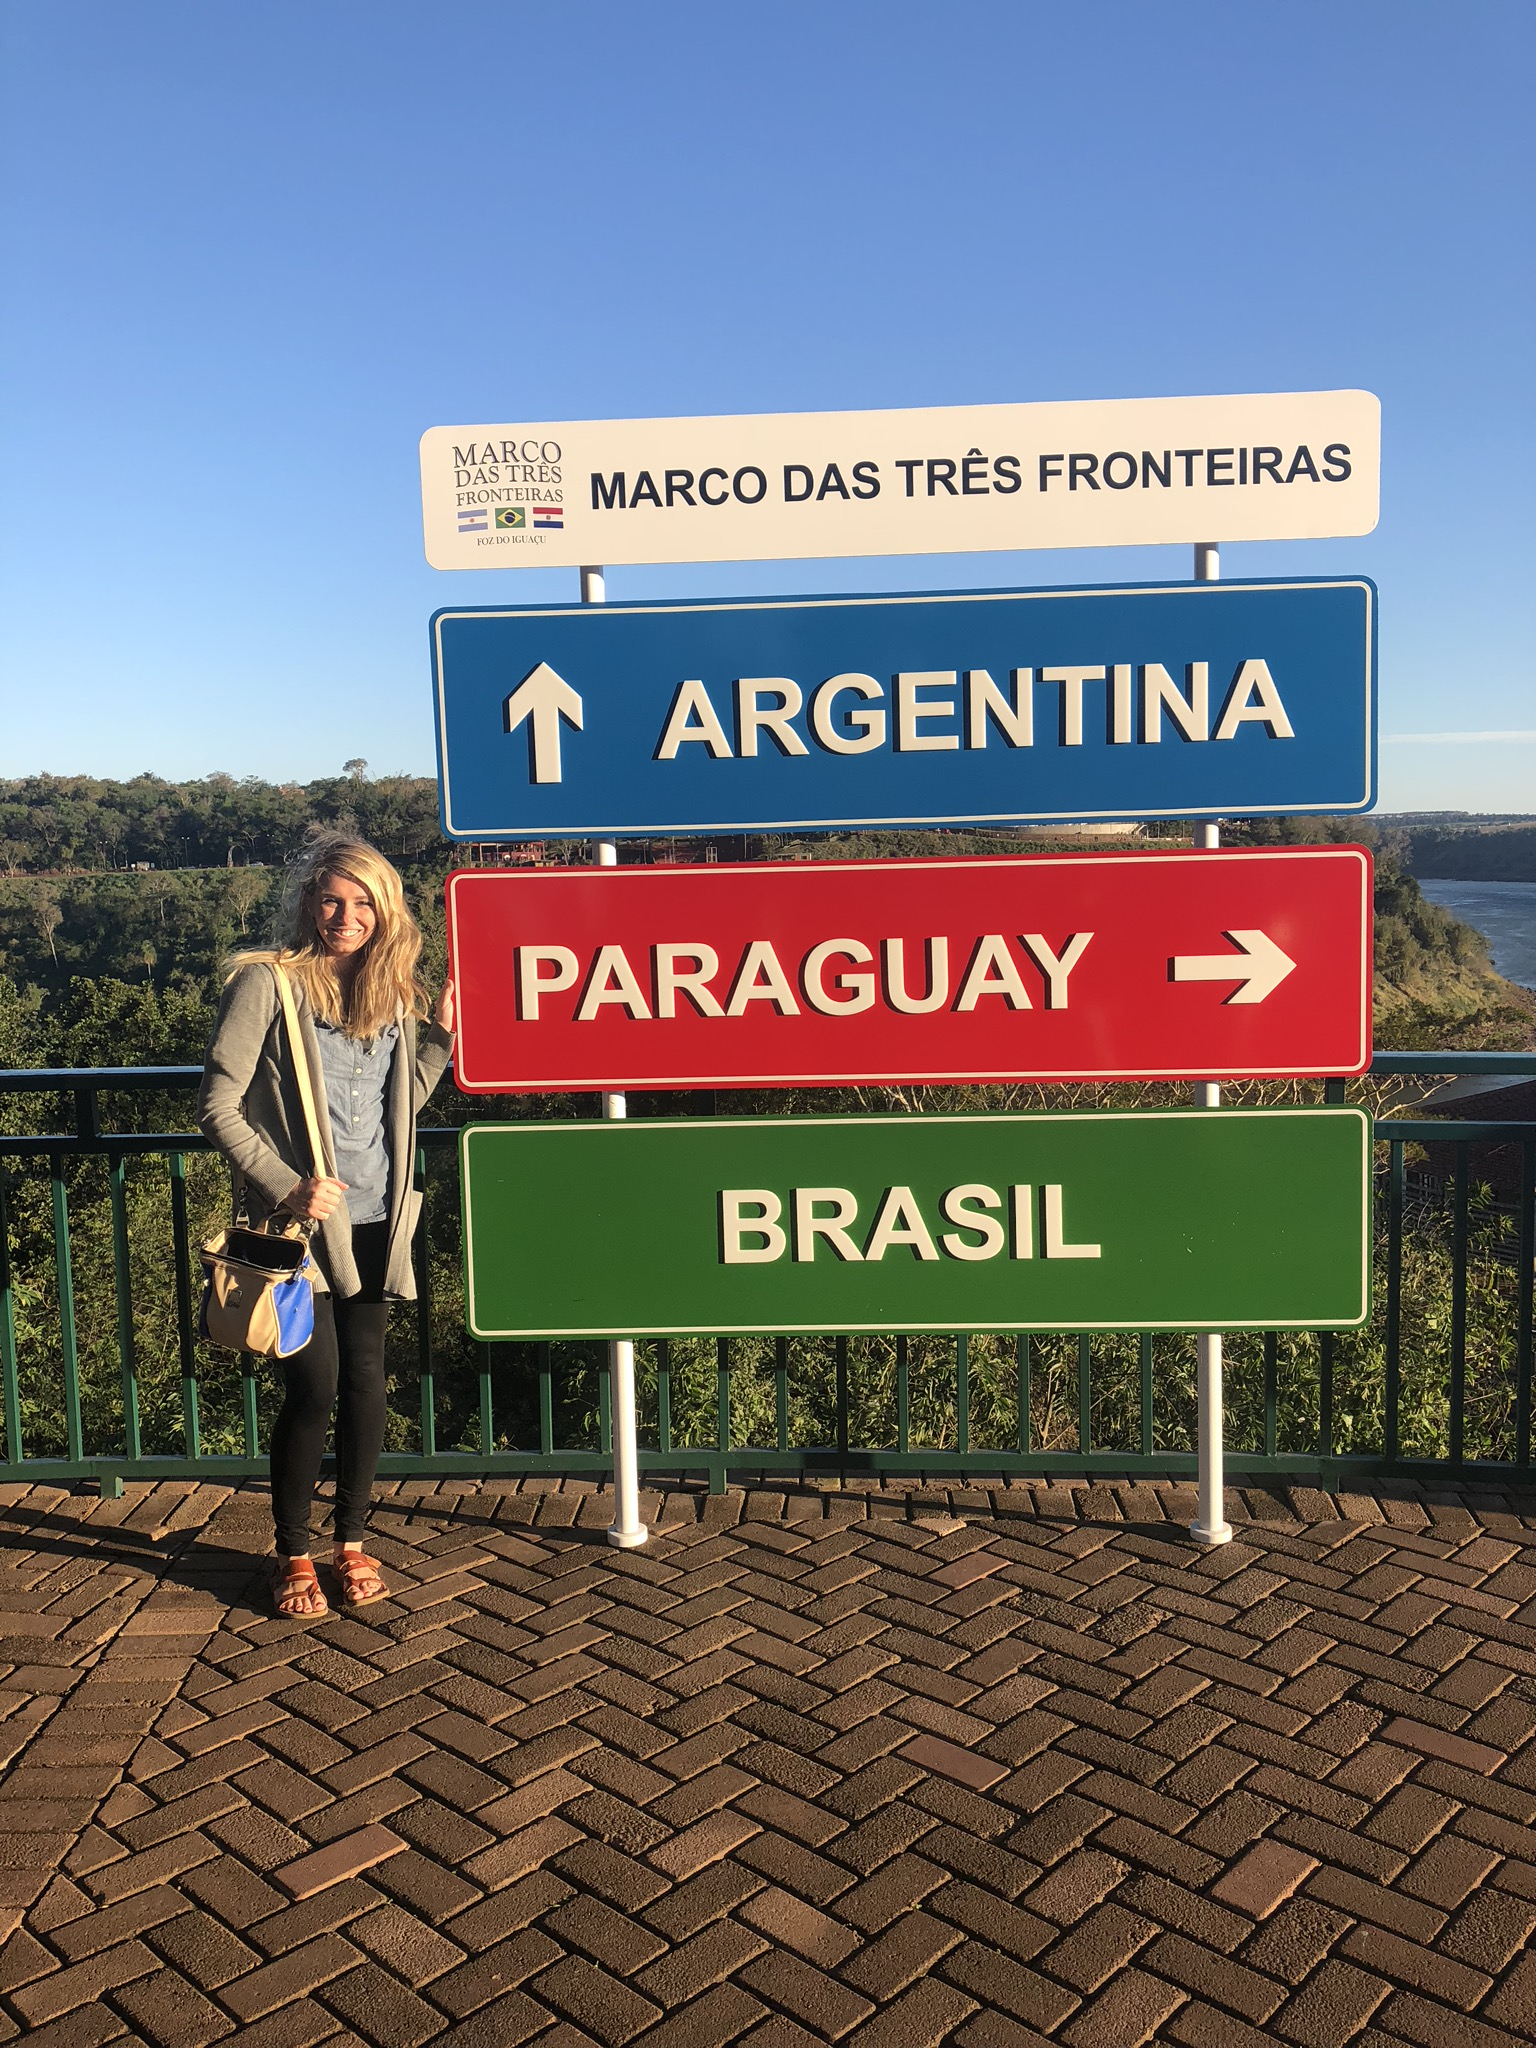 Three Boarders Landmark (Marco das Tres Fronteiras) in Brazil